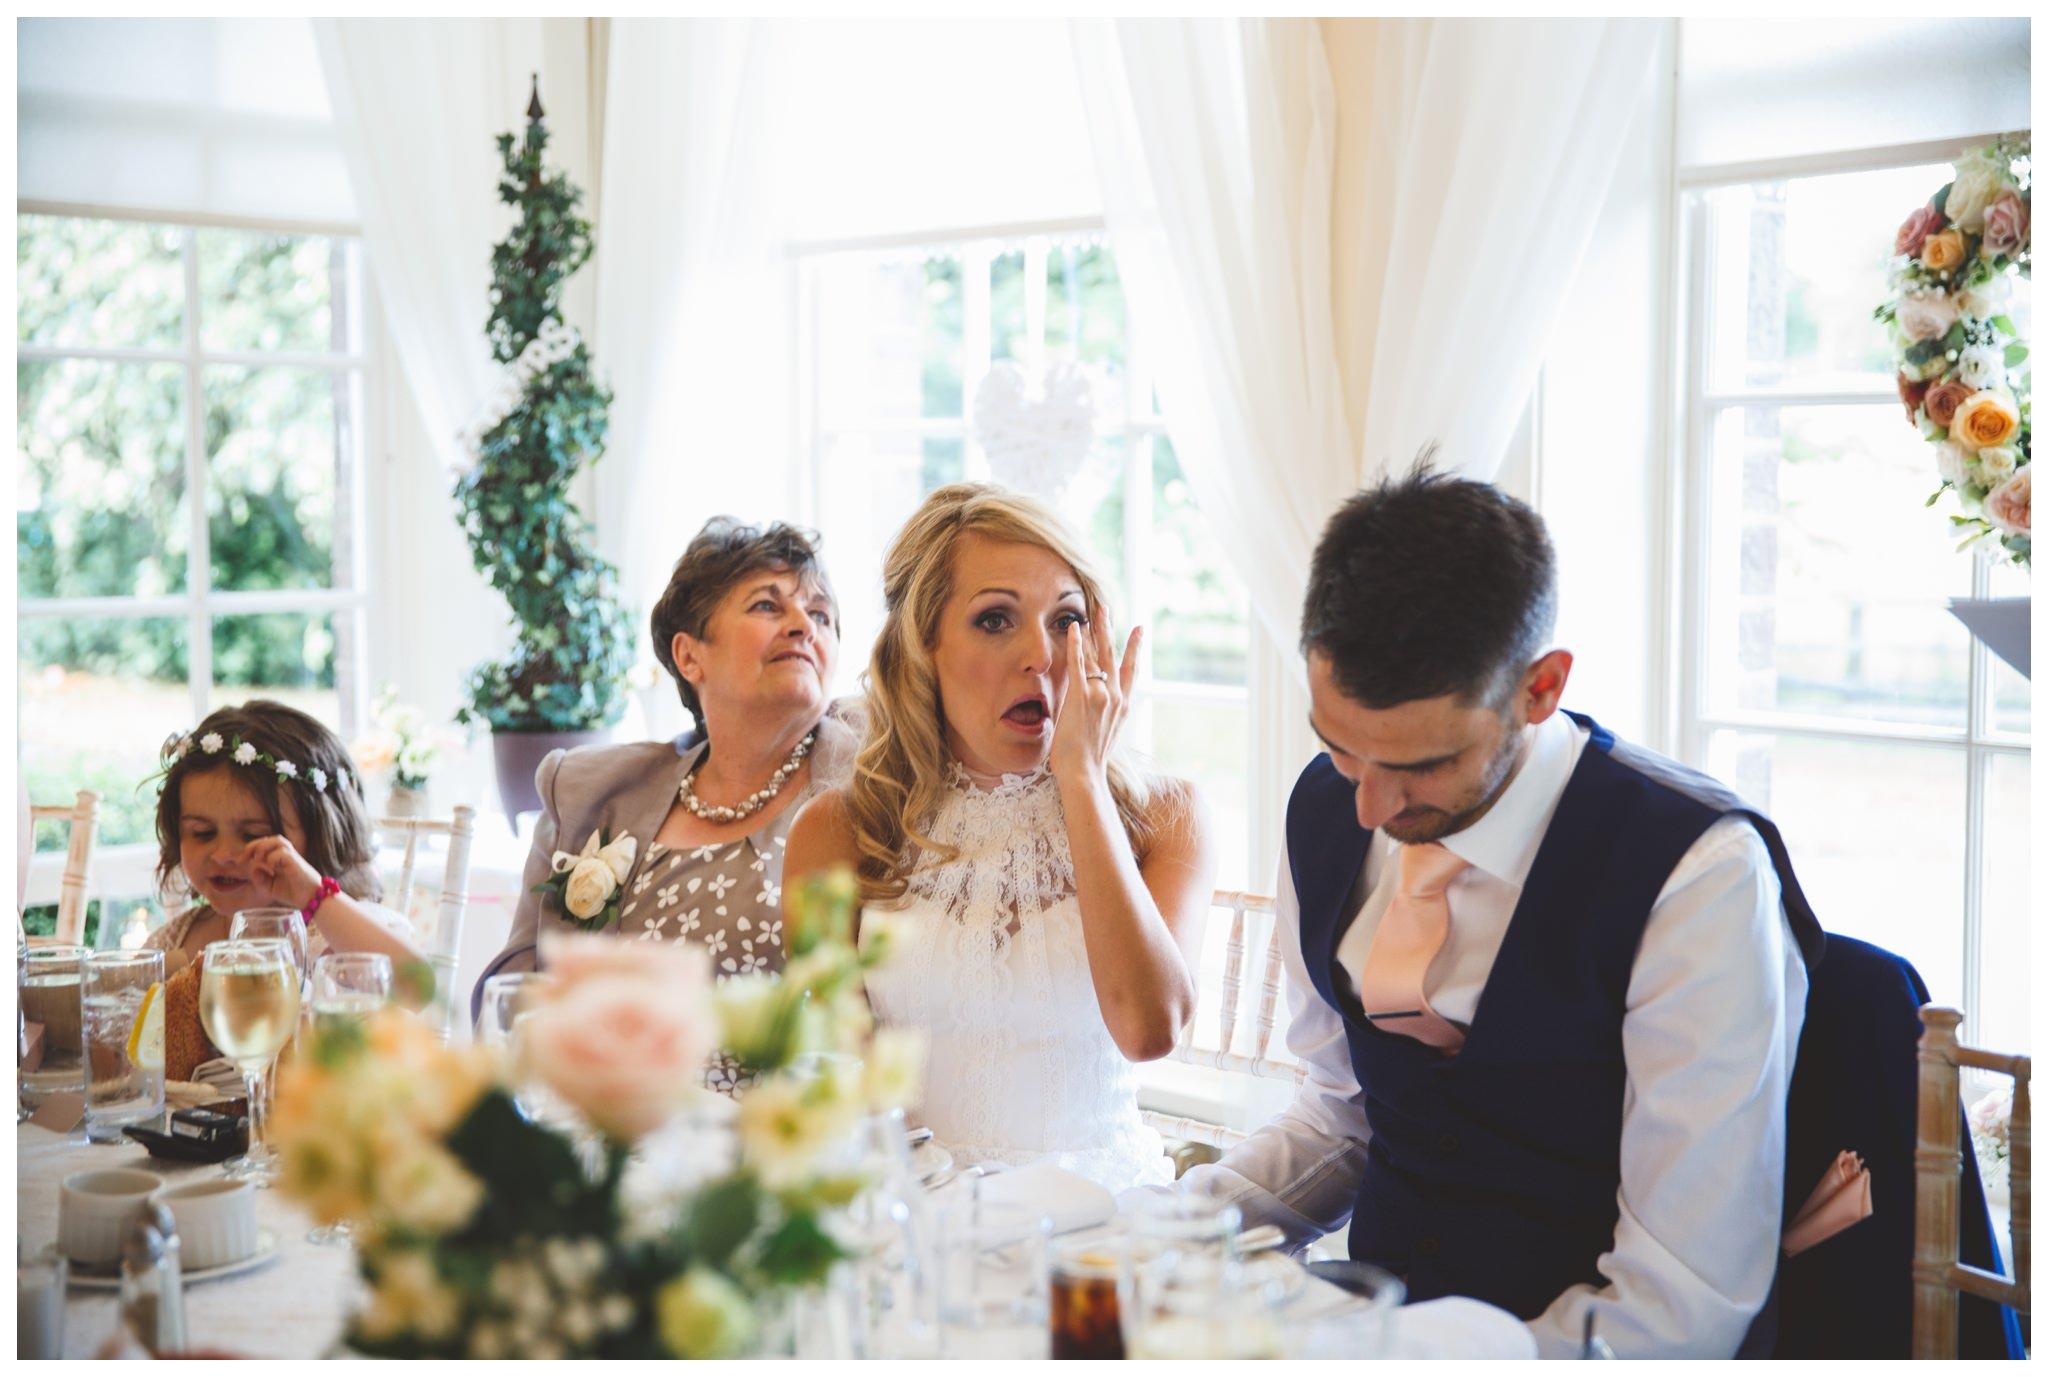 Richard Savage Photography - Wedding - Peterstone Court Brecon - 2016-05-11_0049